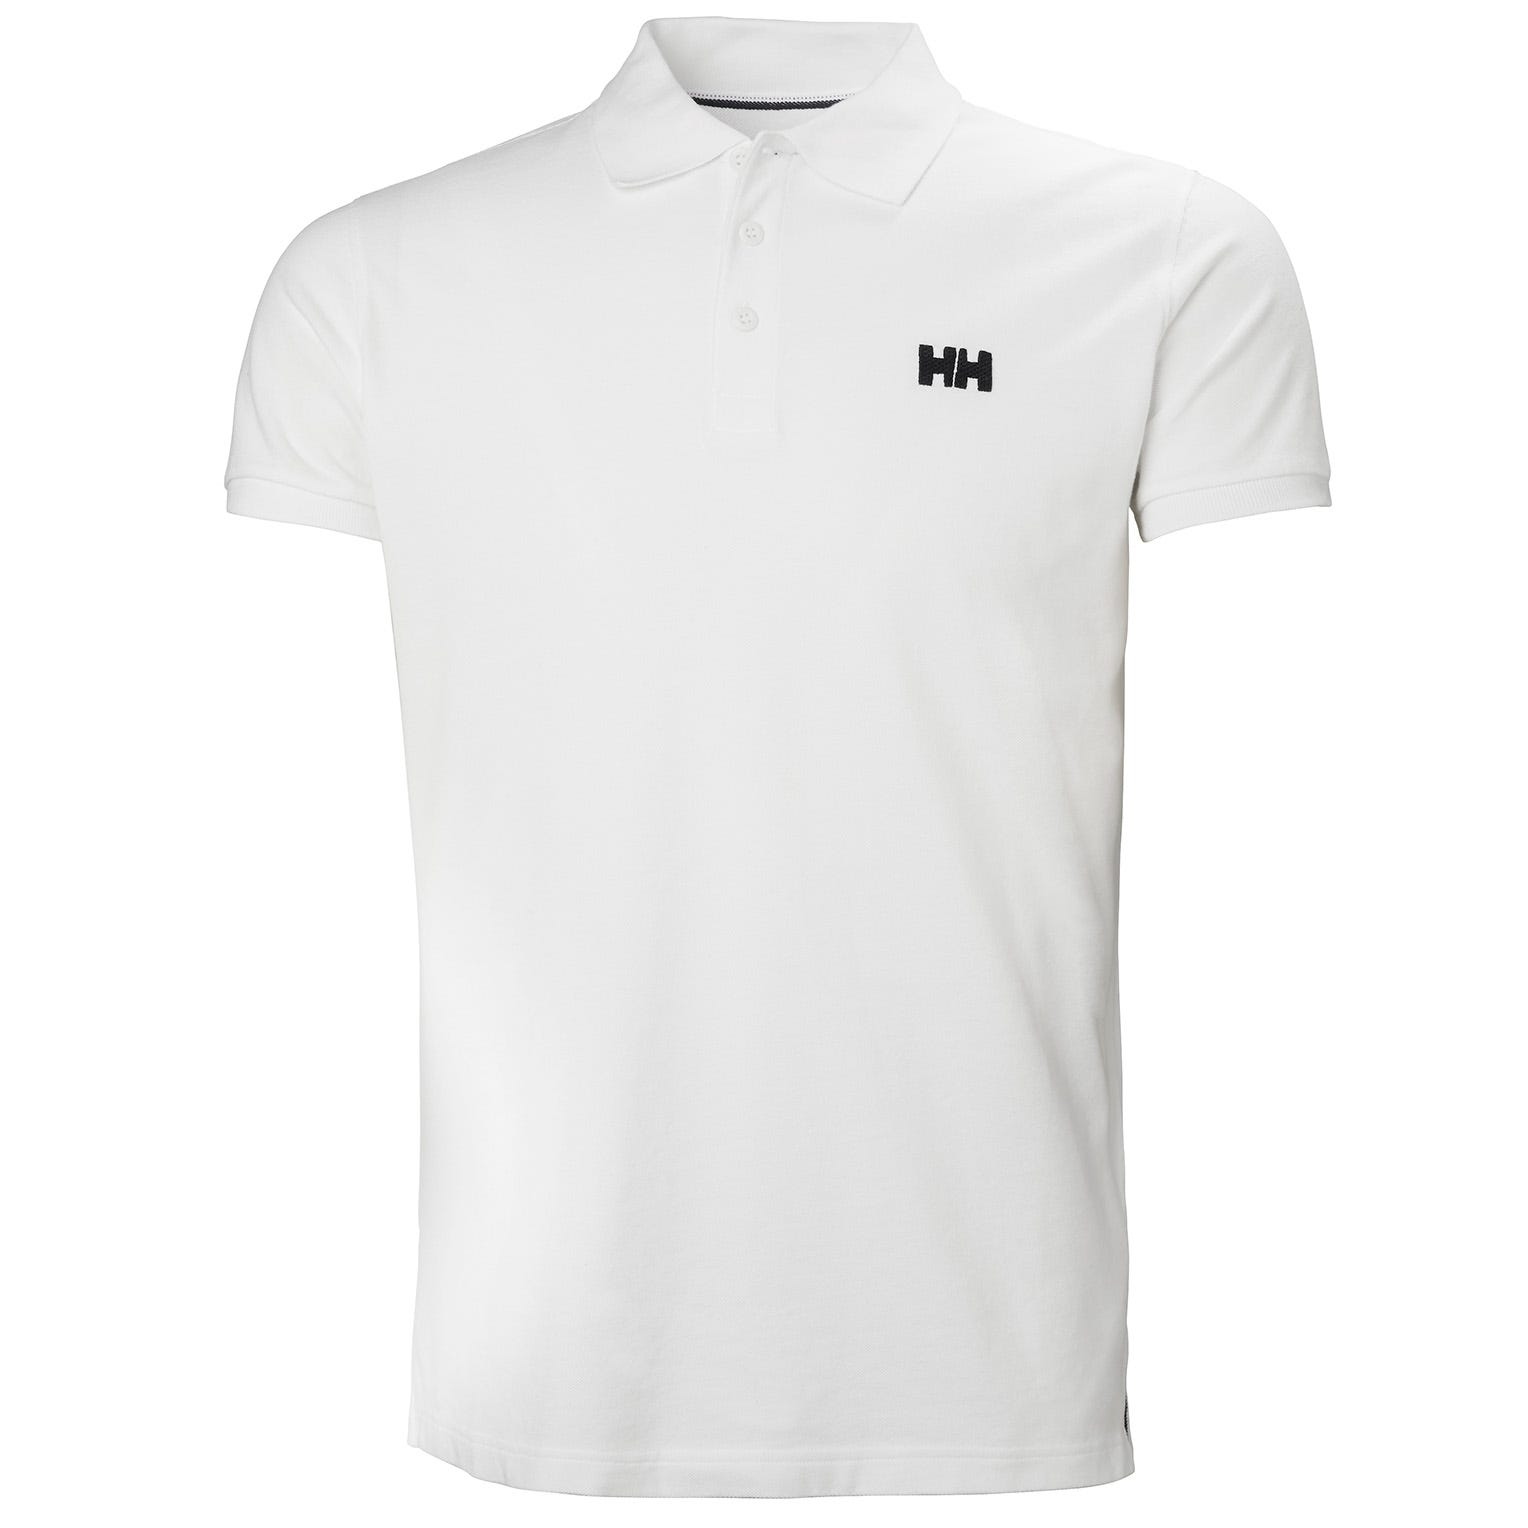 Mens Transat Cotton Short-sleeve Polo Shirt | Helly Hansen Mens White XL